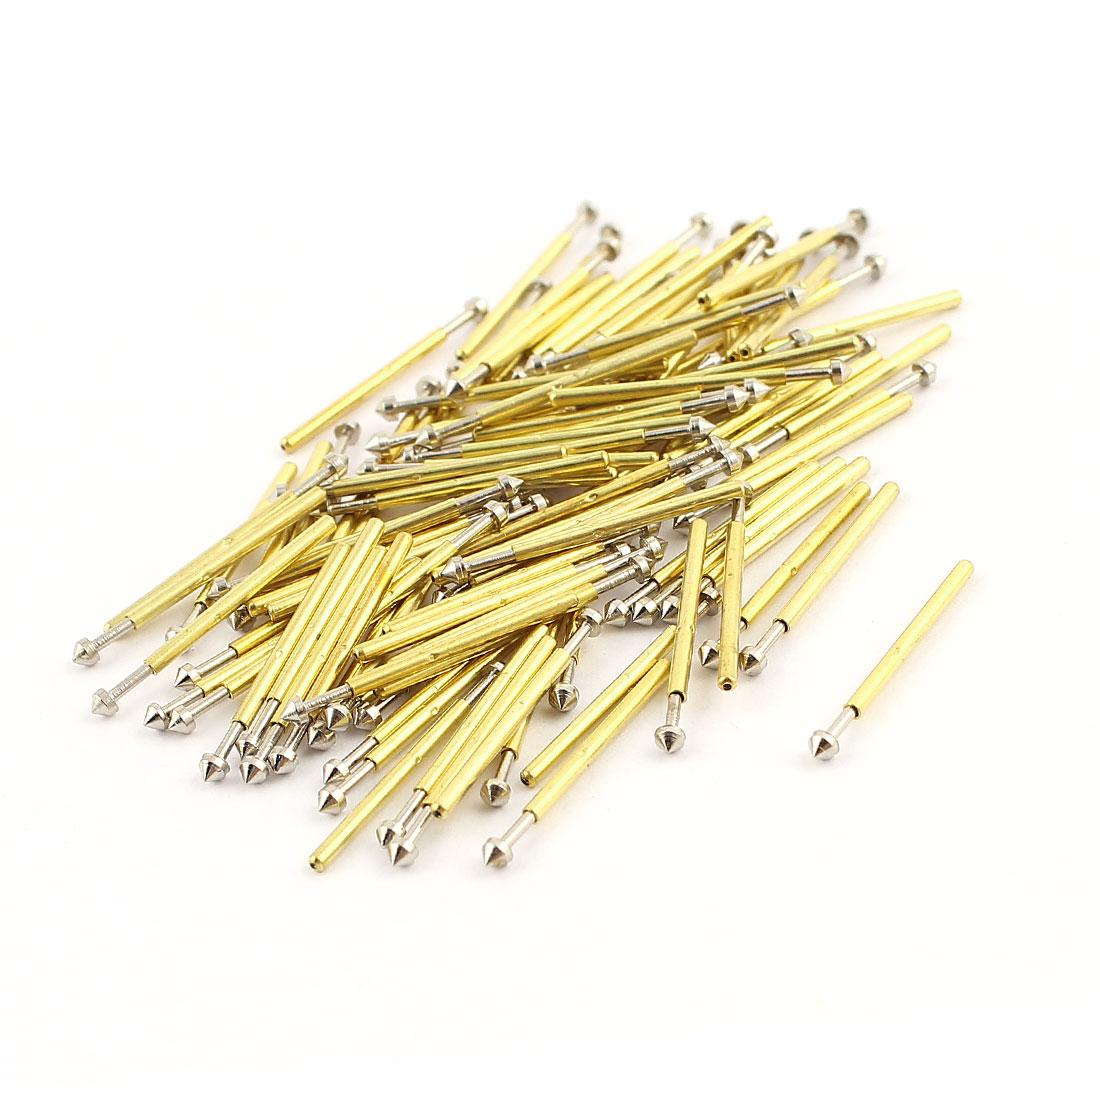 100 Pieces P75-E3 Dia 1.02mm 100g Spring Test Probe Pin for PCB Board